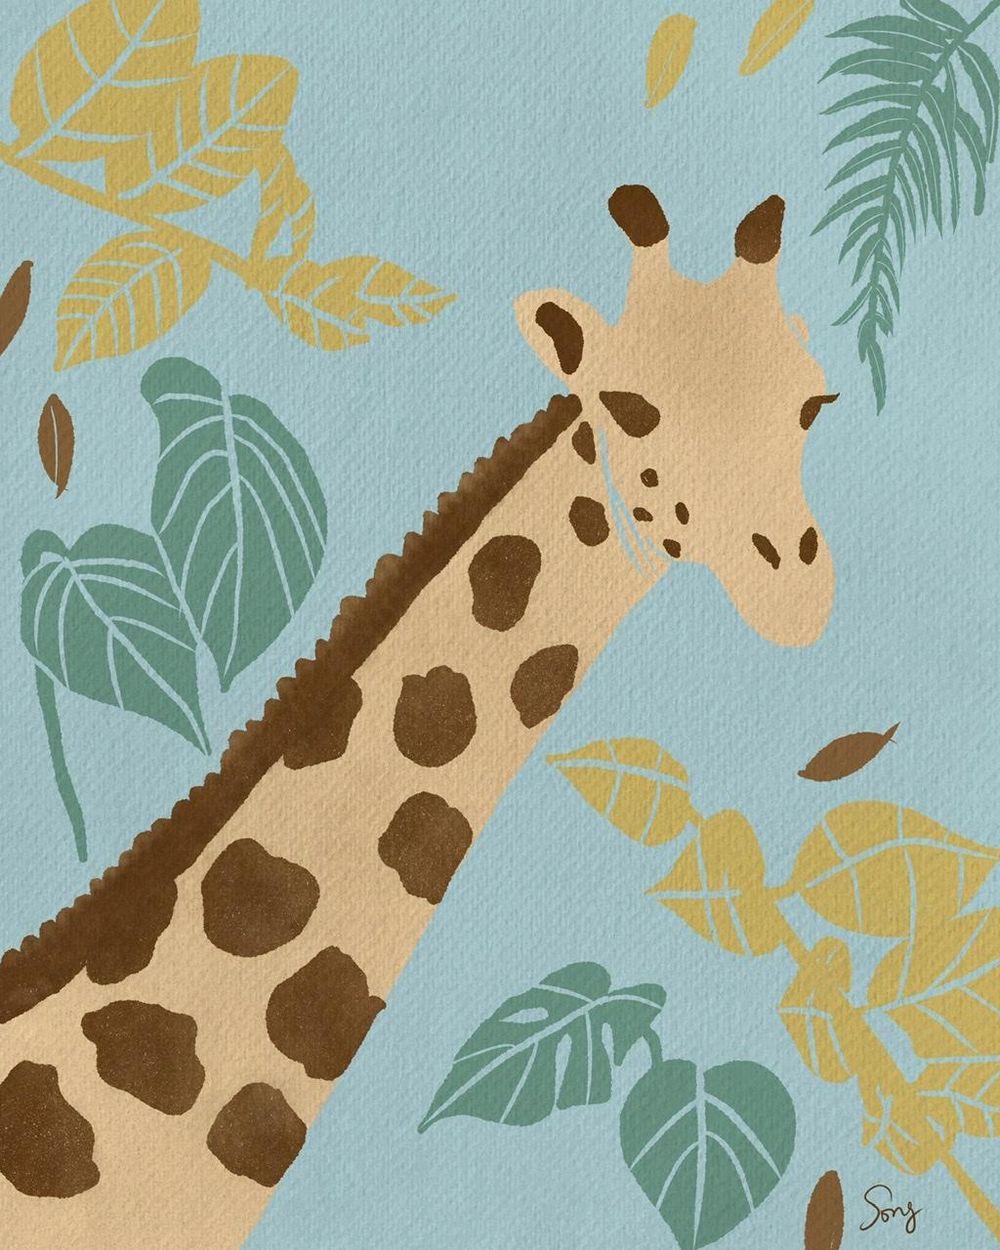 SummerGiraffe - image 1 - student project